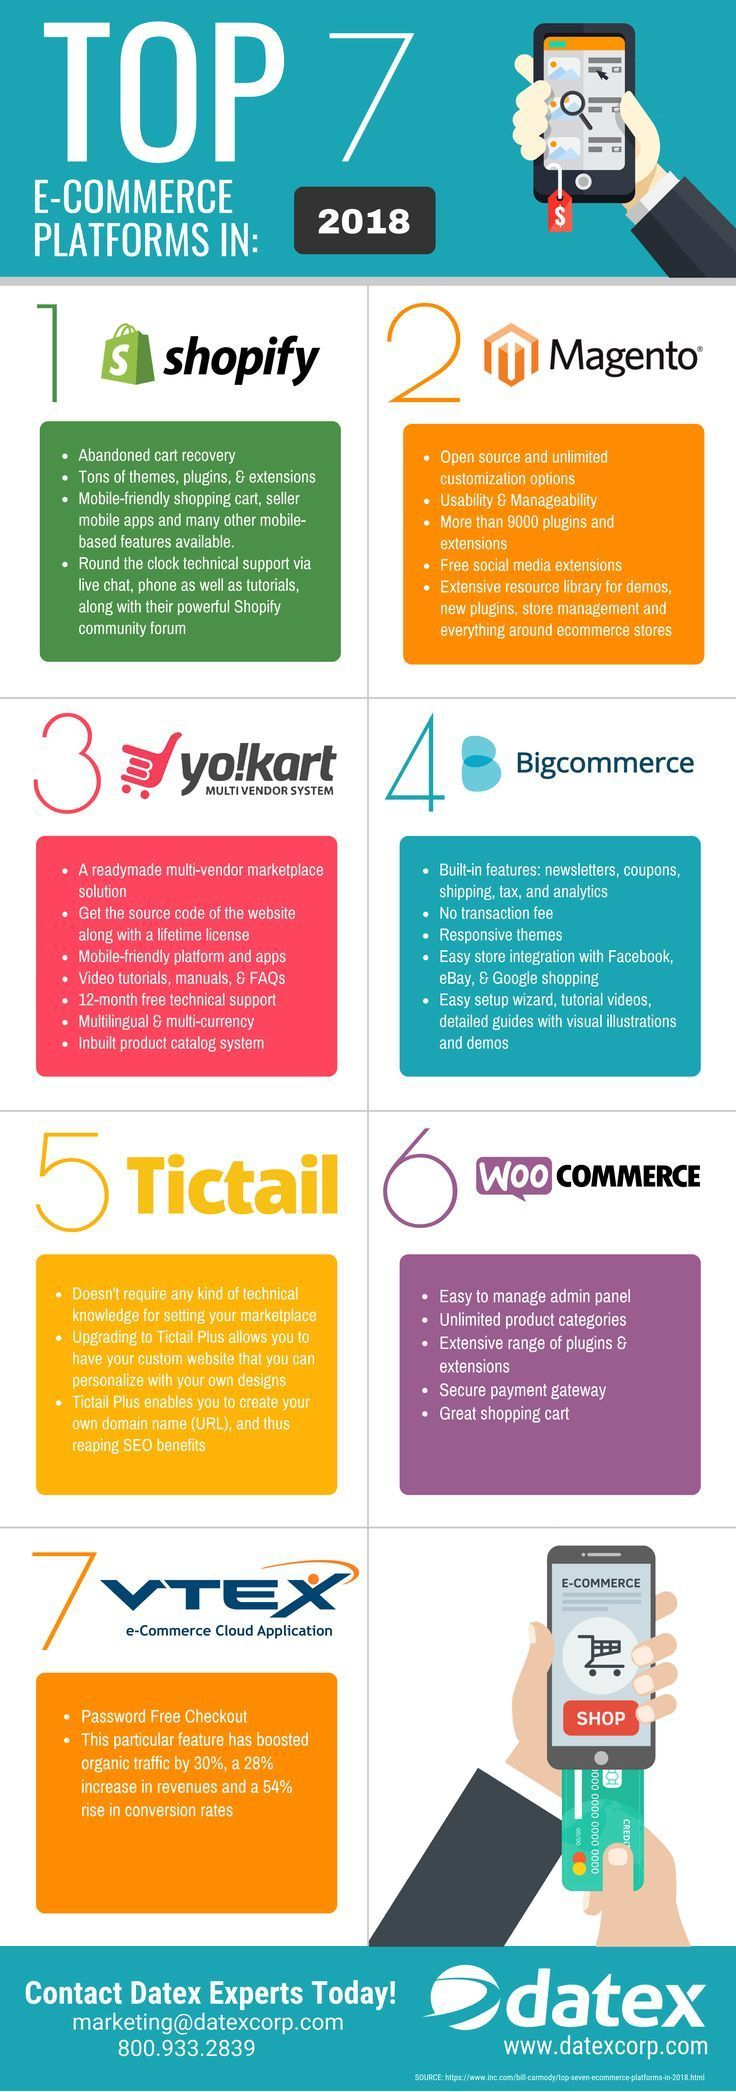 Top 5 Best Practices For Online Shopping Websites Web Design Tips Ecommerce Startup Ecommerce Marketing Marketing